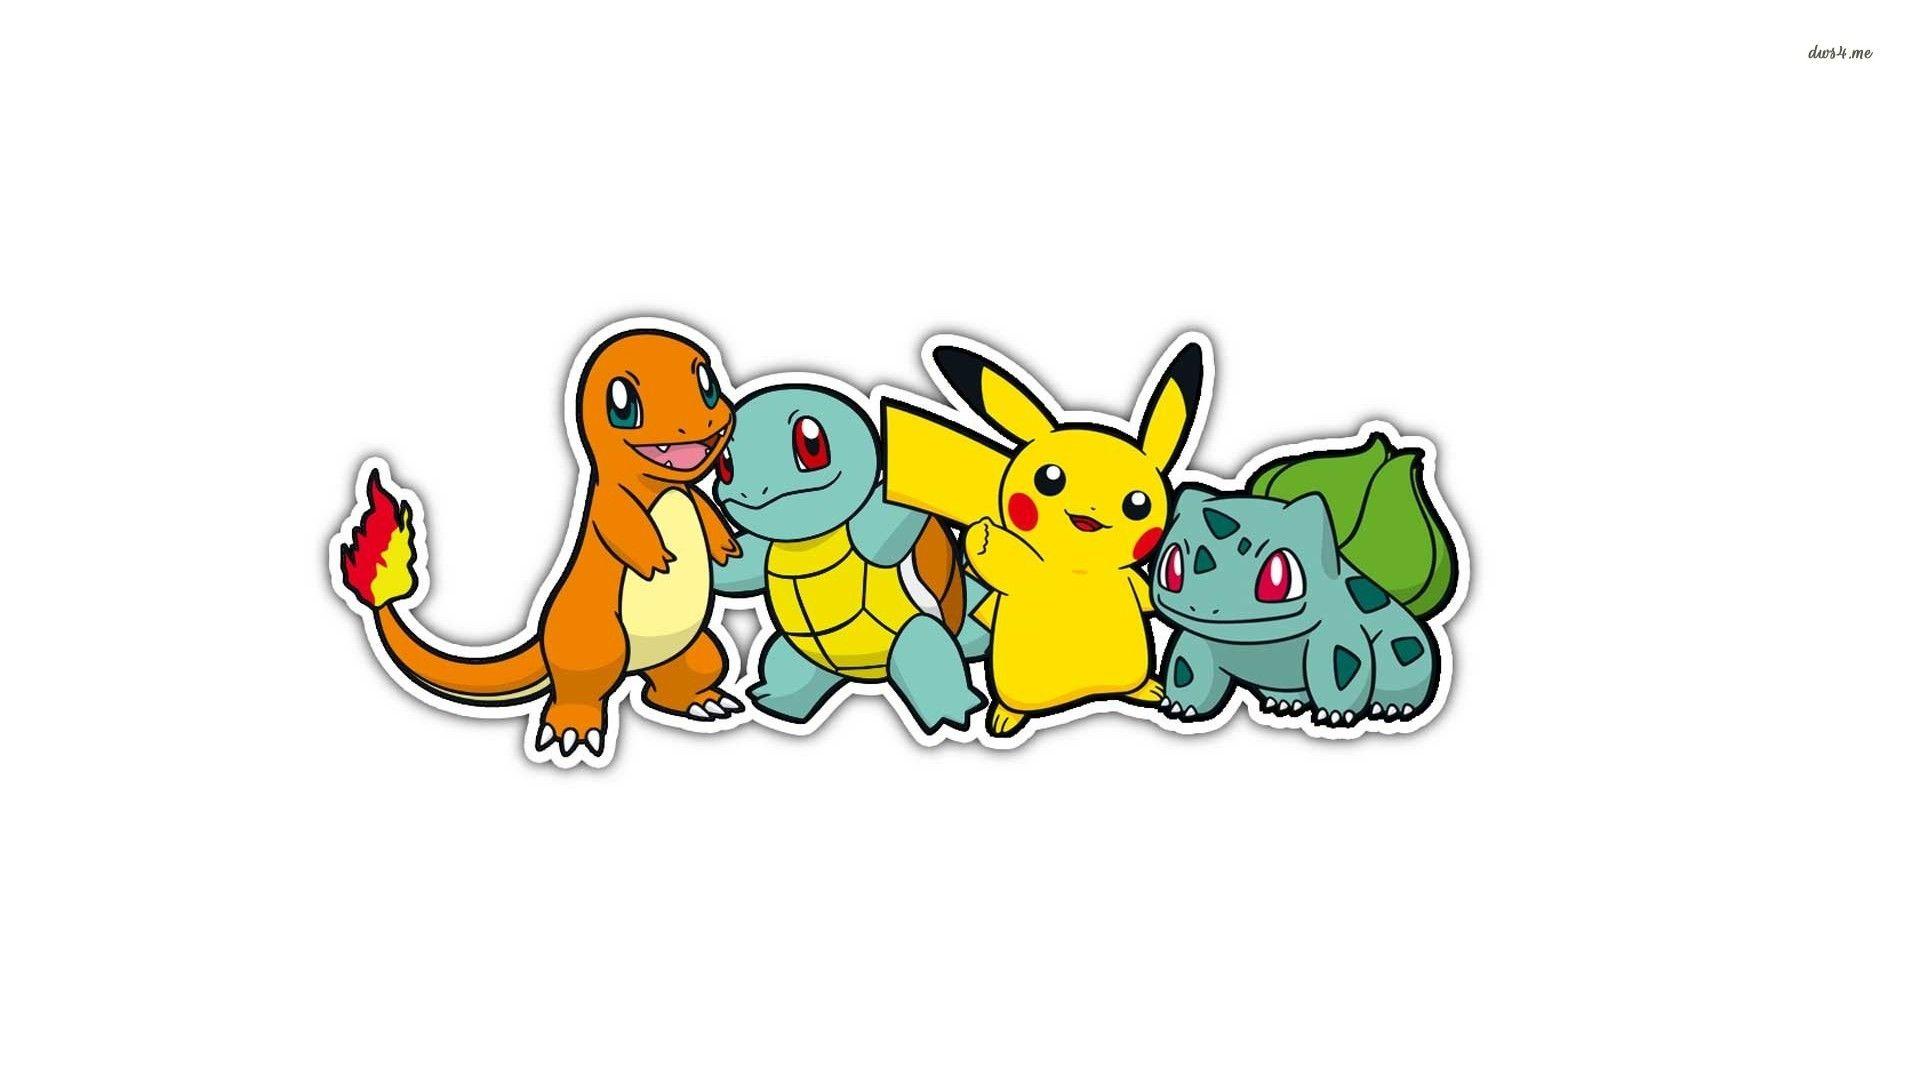 Pokemon Wallpapers Screensaver Wallpaper Cute Pokemon Wallpaper Pokemon Backgrounds Cute Pokemon